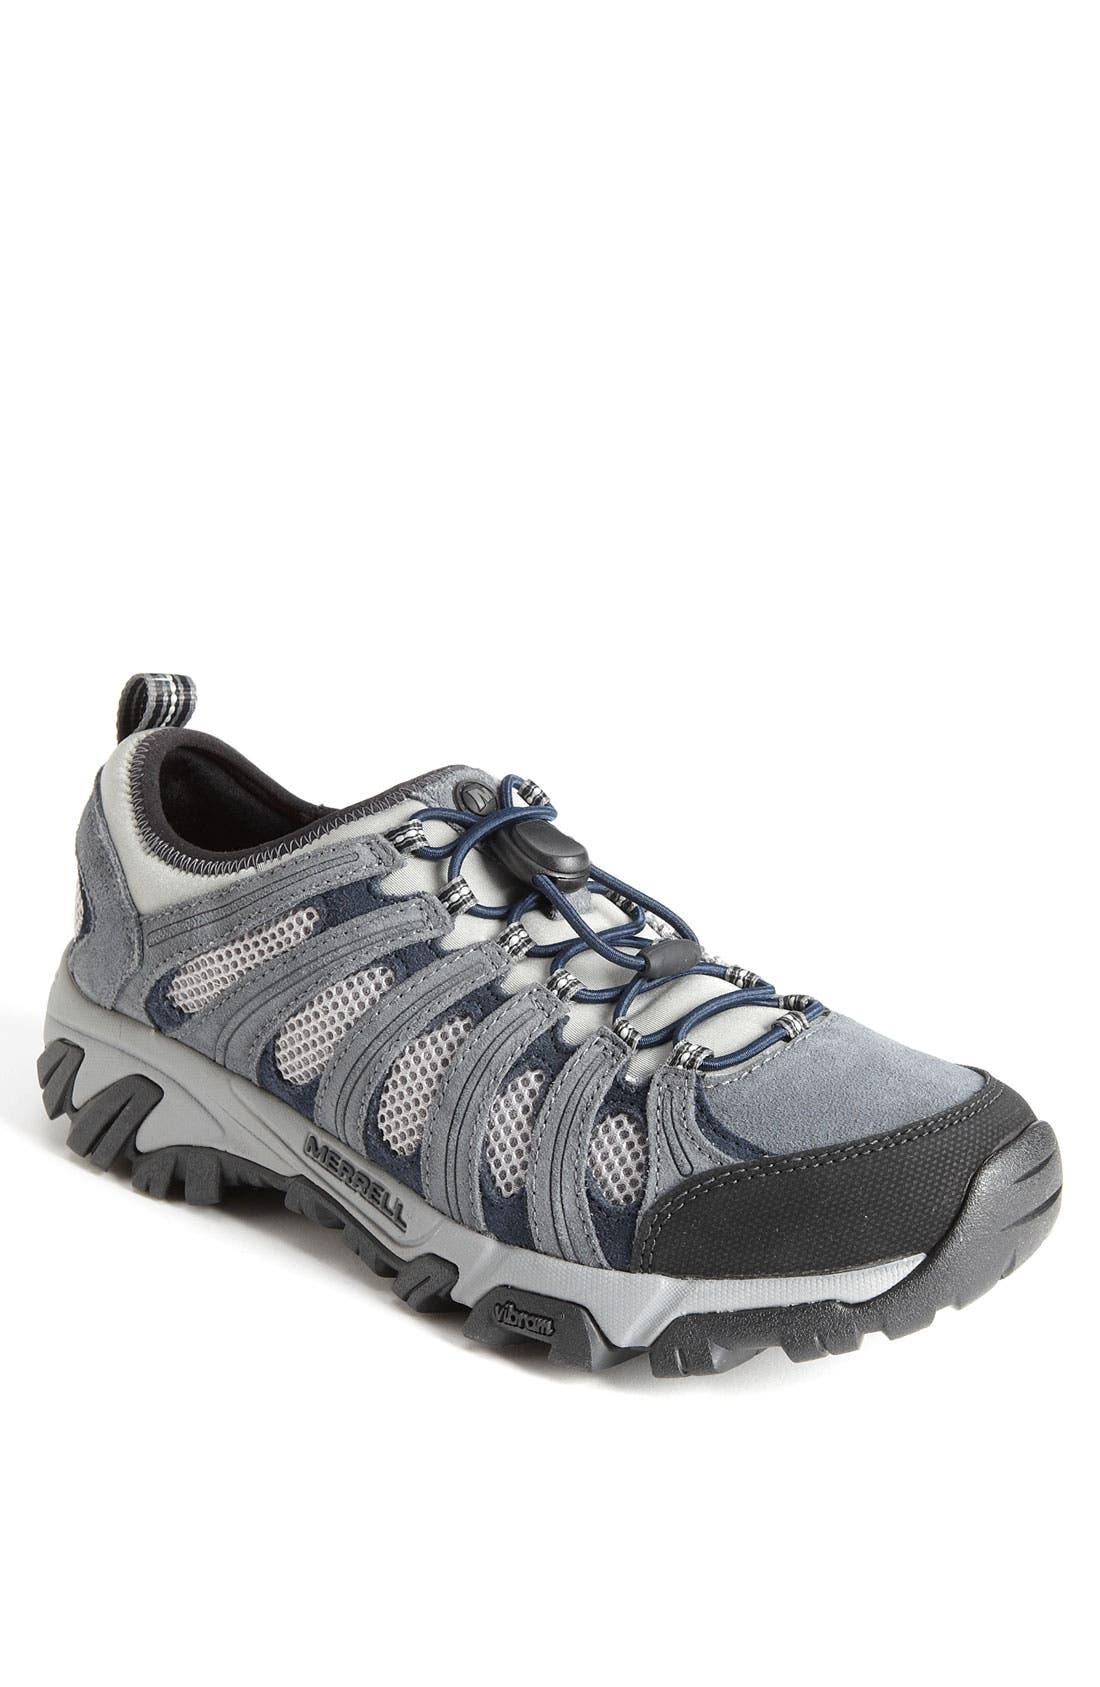 Main Image - Merrell 'Geomorph Maze Stretch' Hiking Shoe (Men)